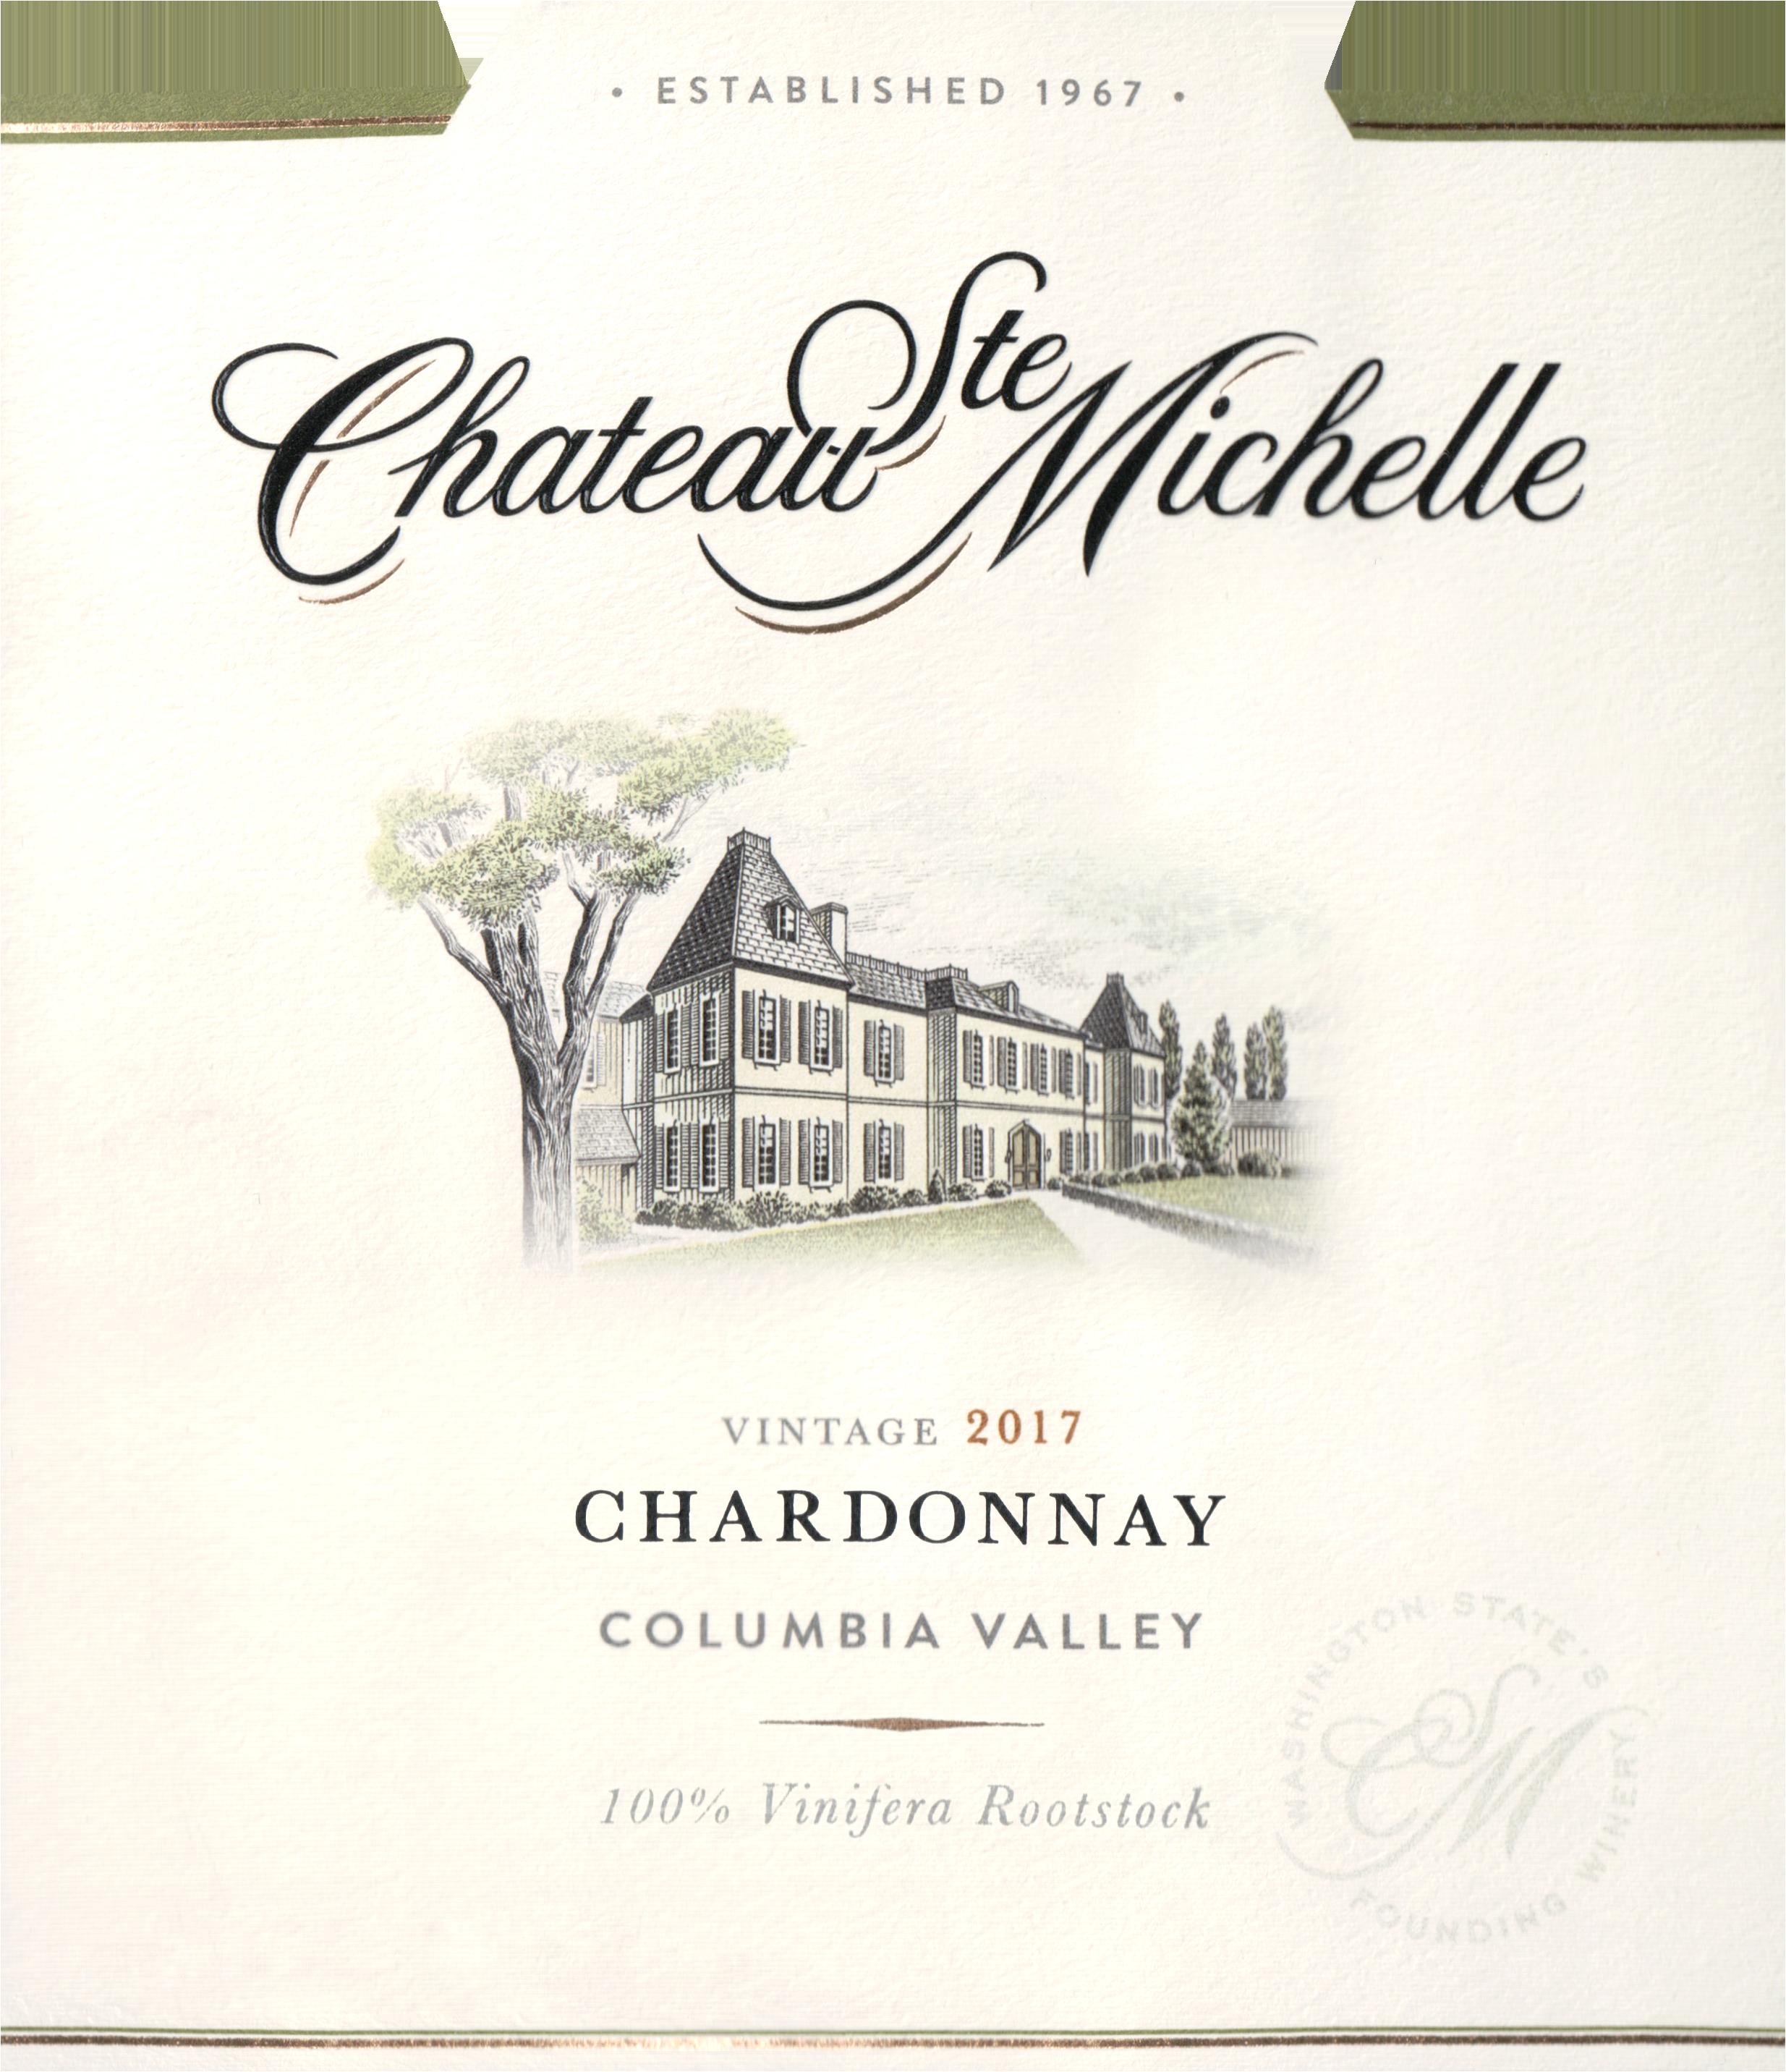 Chateau St Michelle Chardonnay 2017